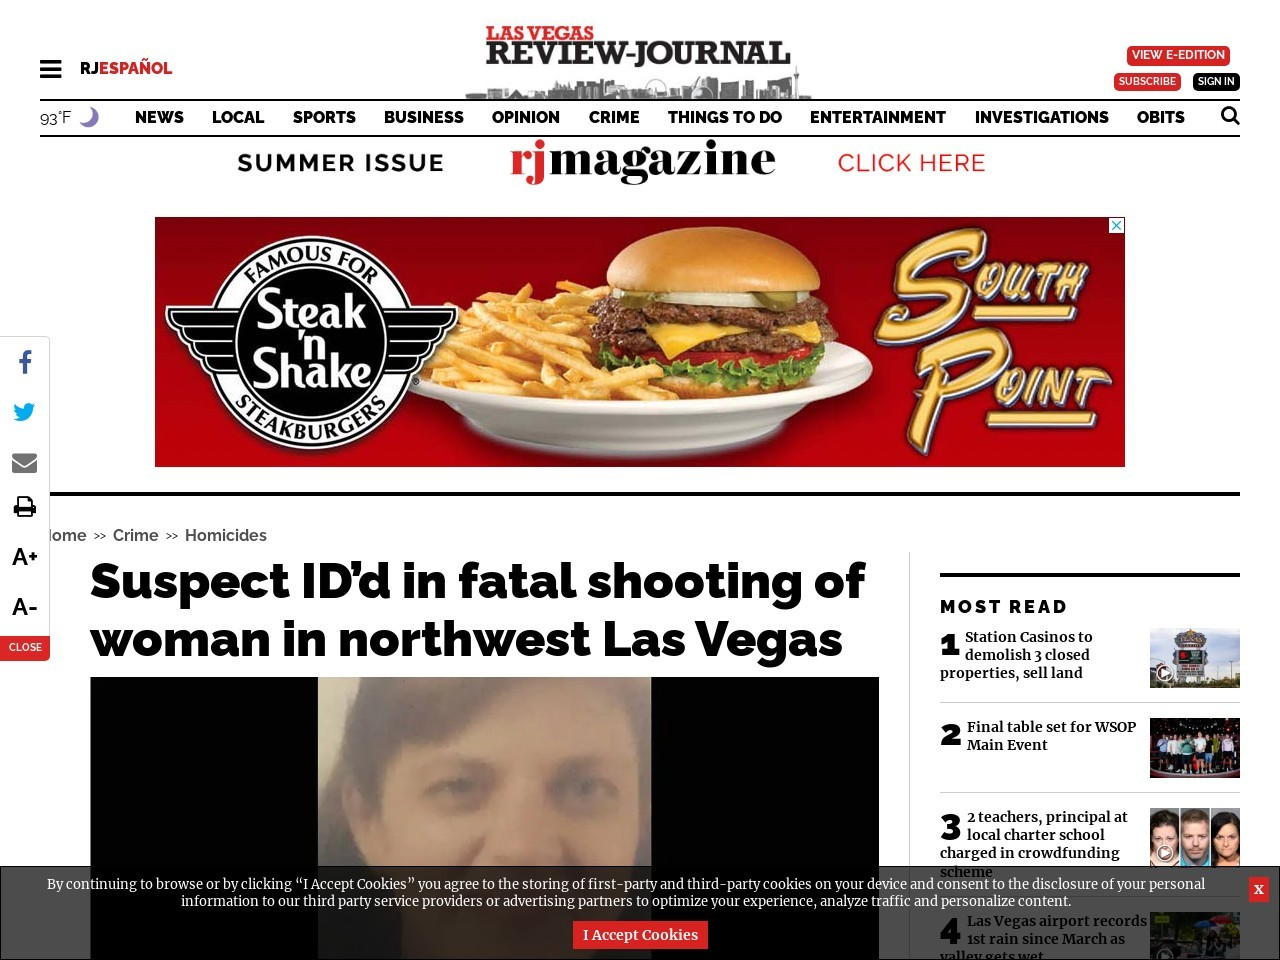 Suspect ID'd in fatal shooting of woman in northwest Las Vegas